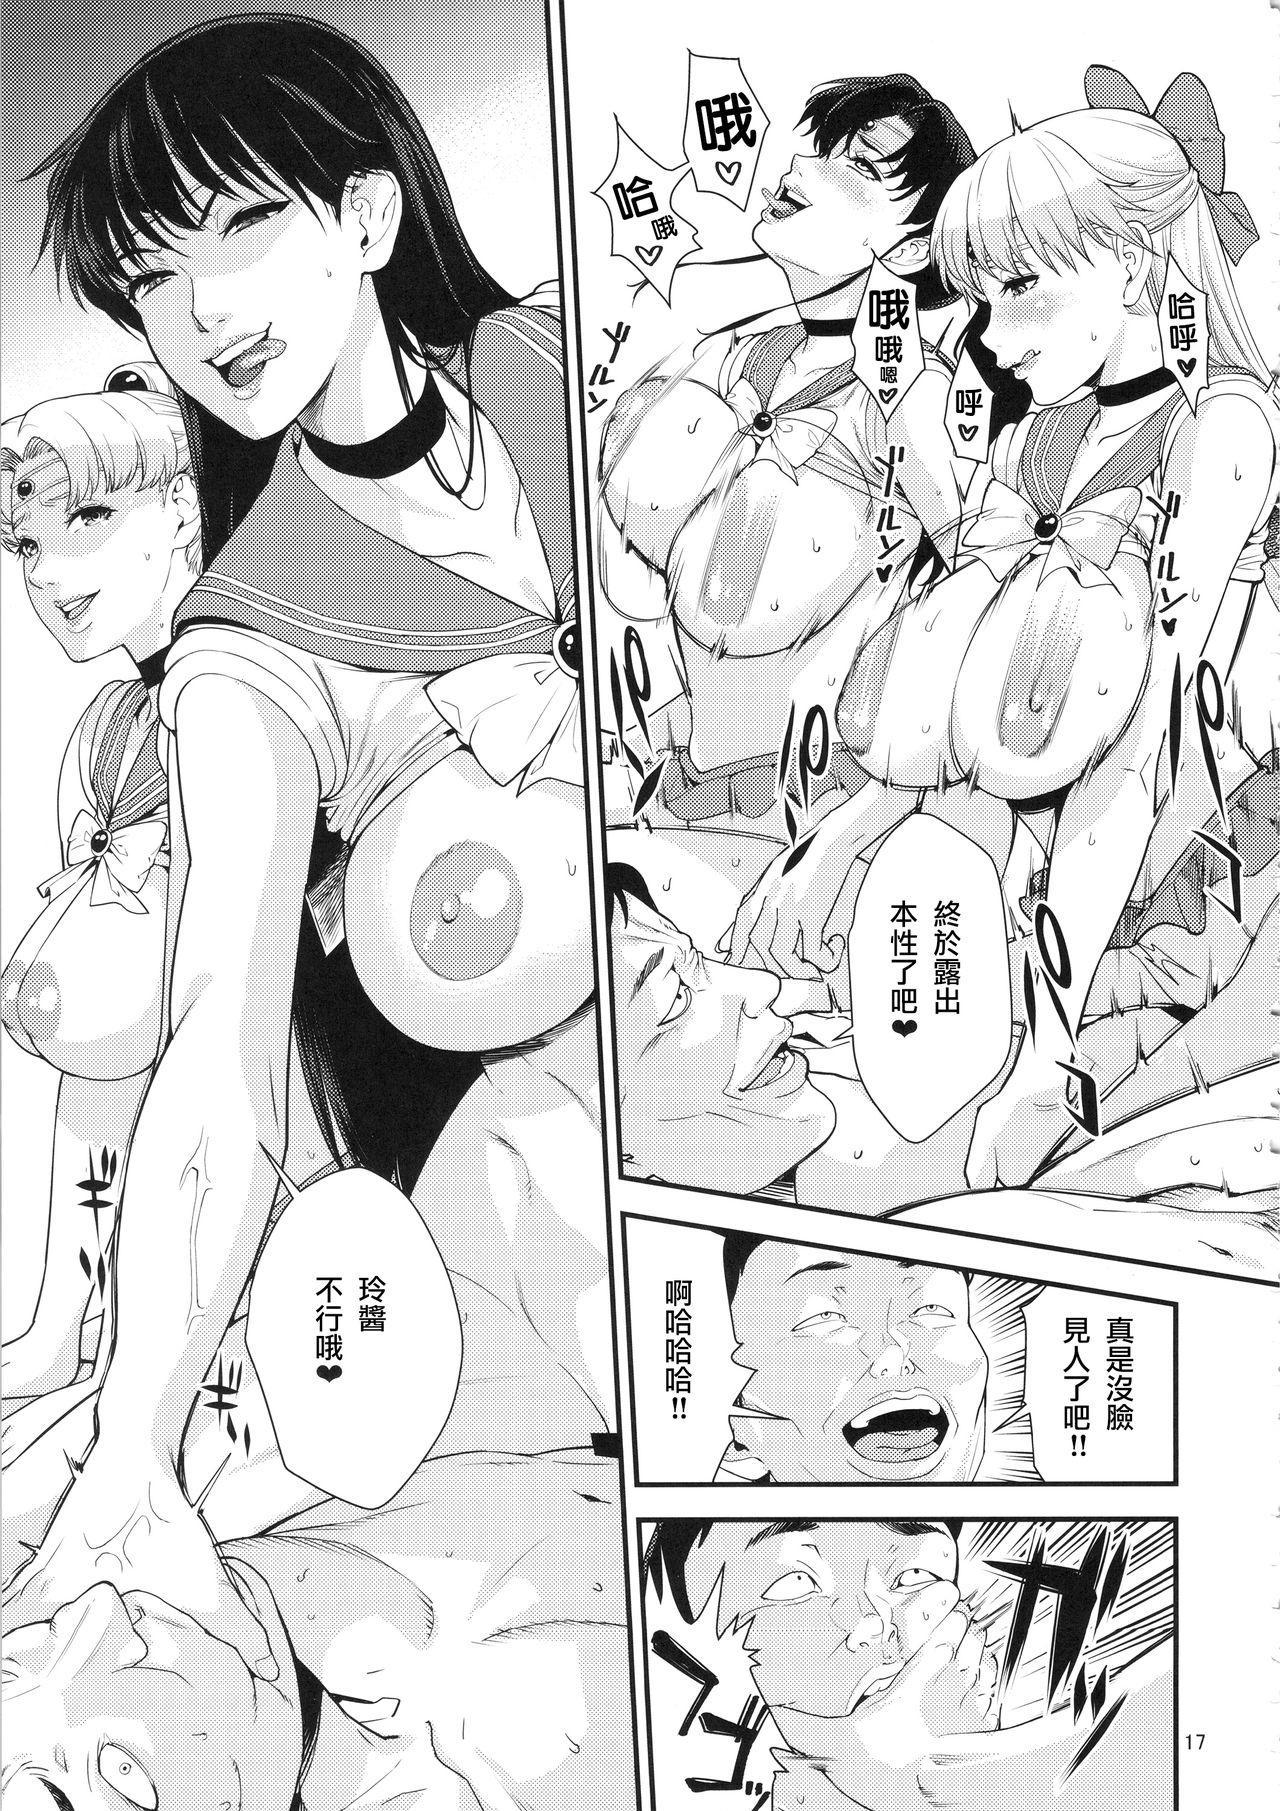 Sailor Moon 15